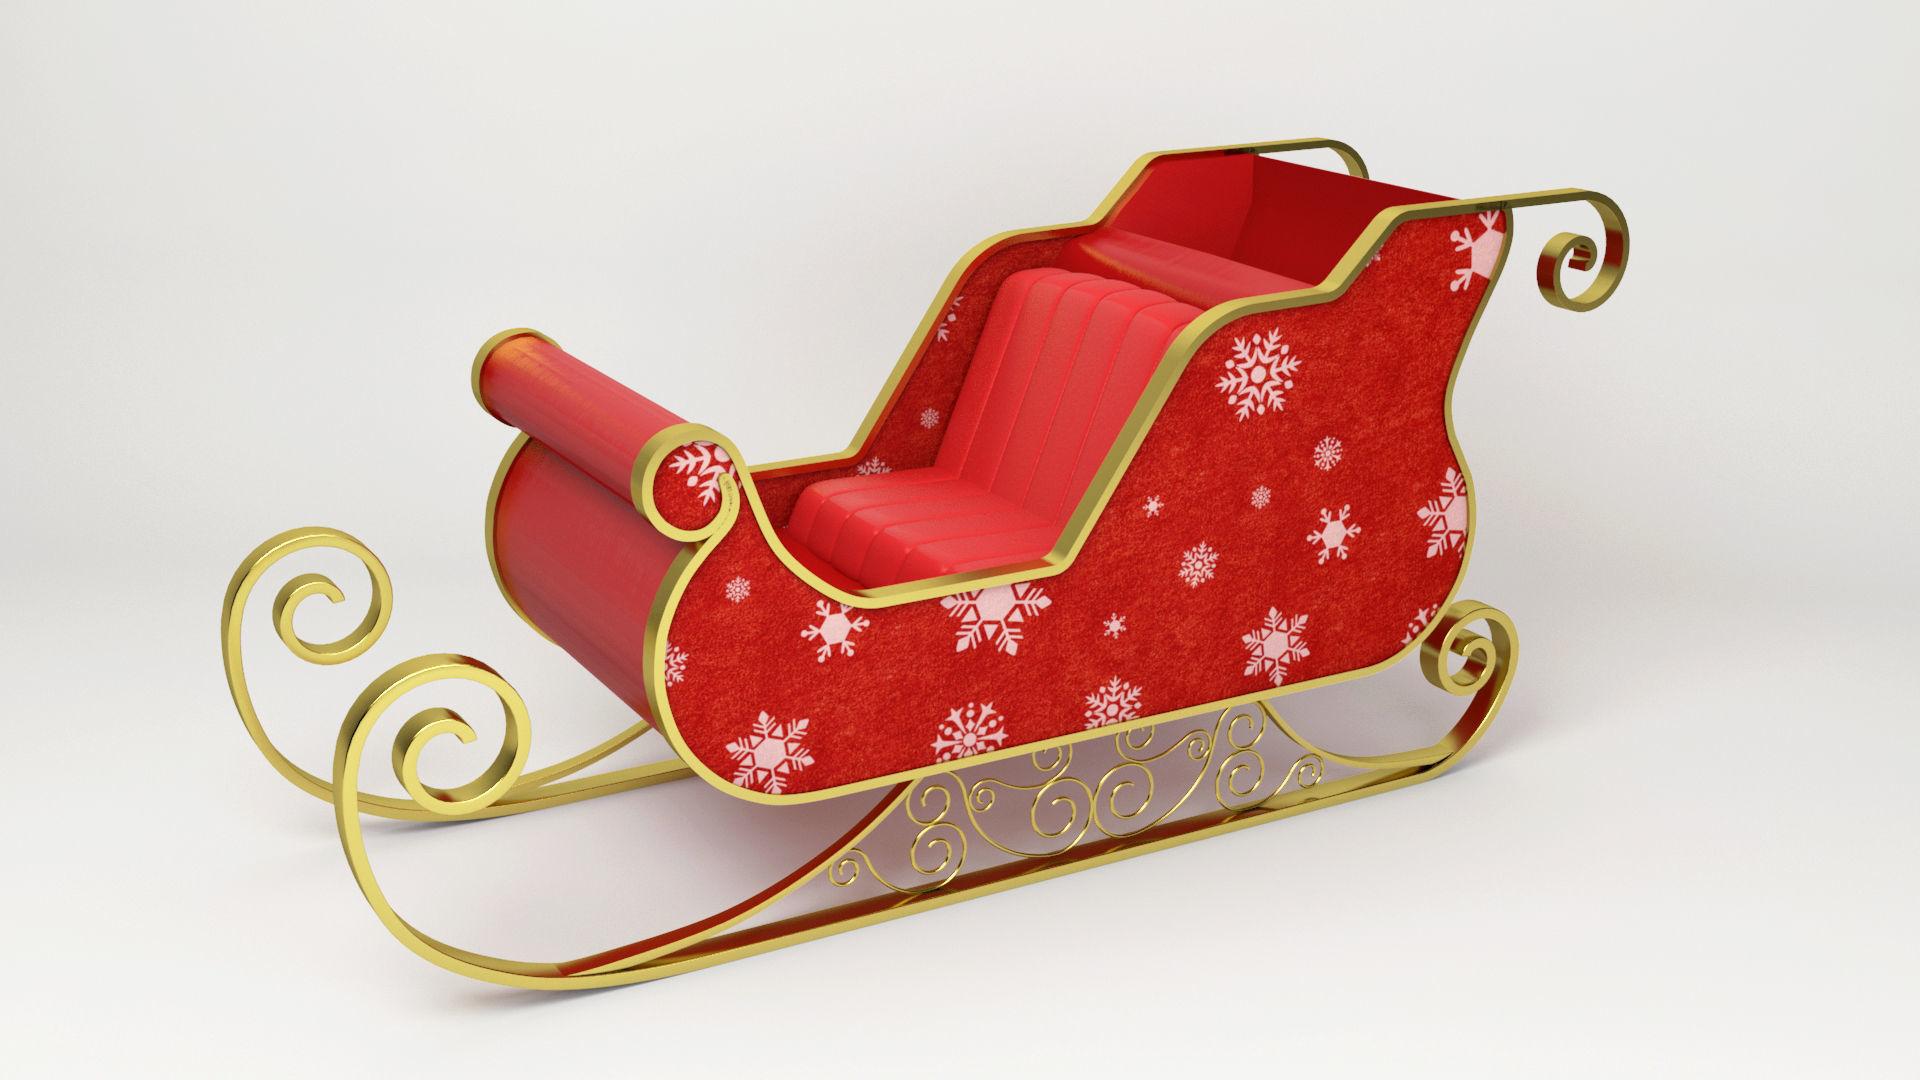 3d santa claus sled christmas sled - Christmas Sled